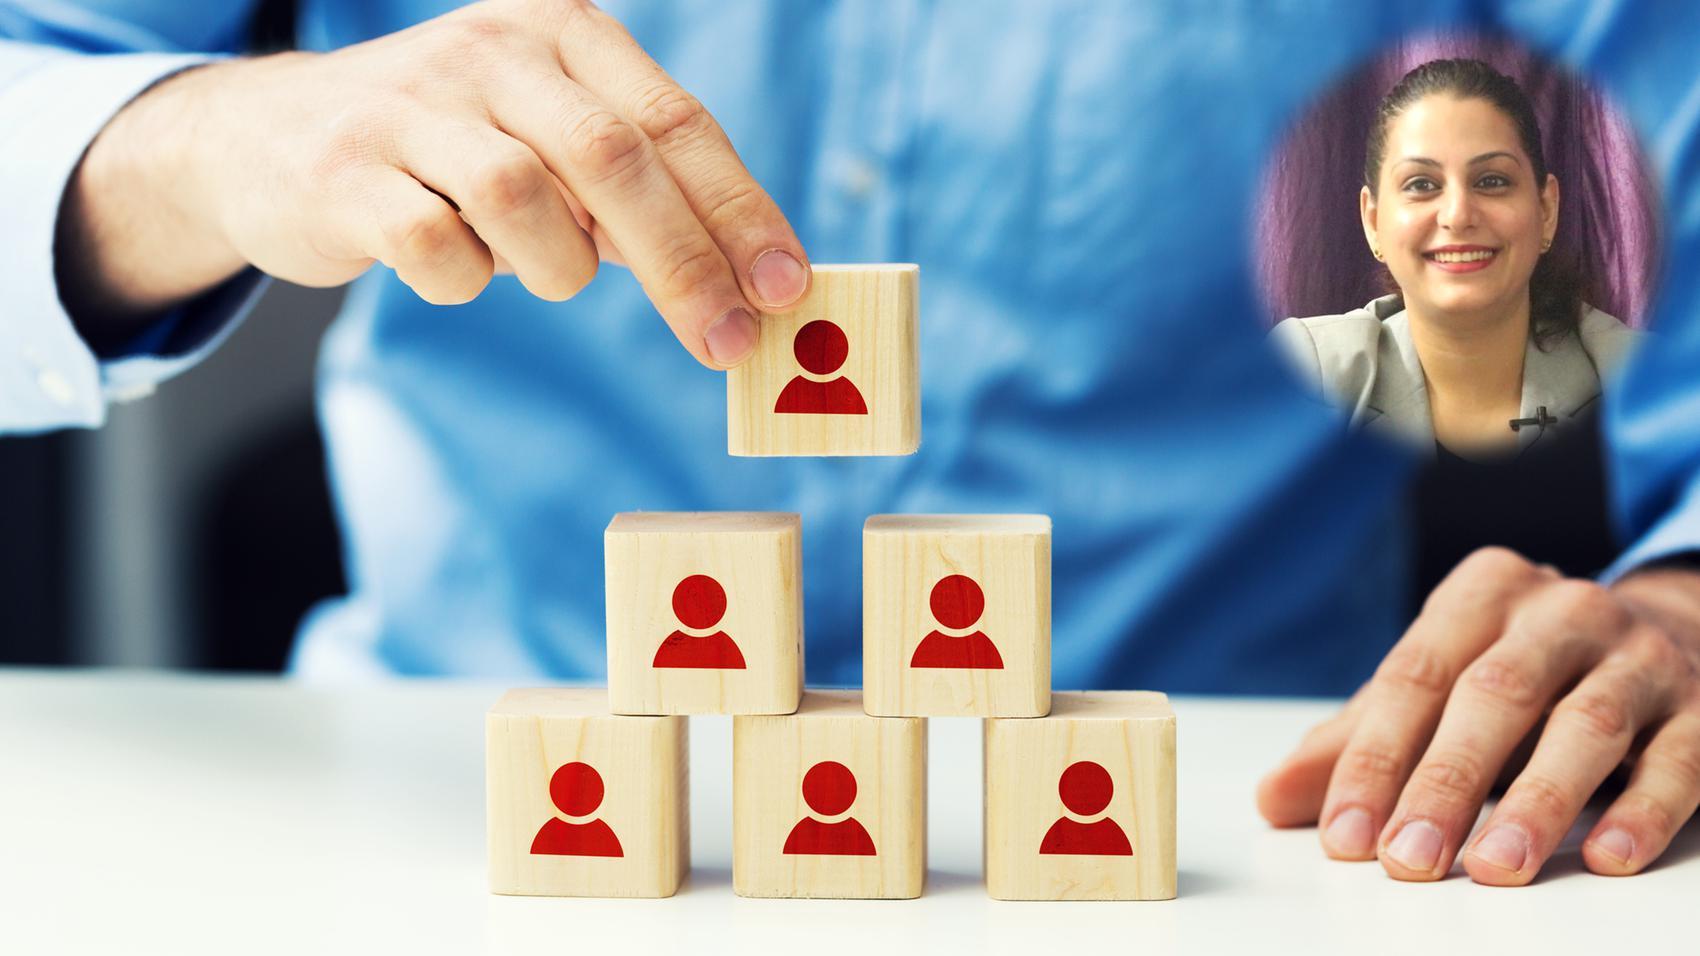 LifePage Career Awareness Platform